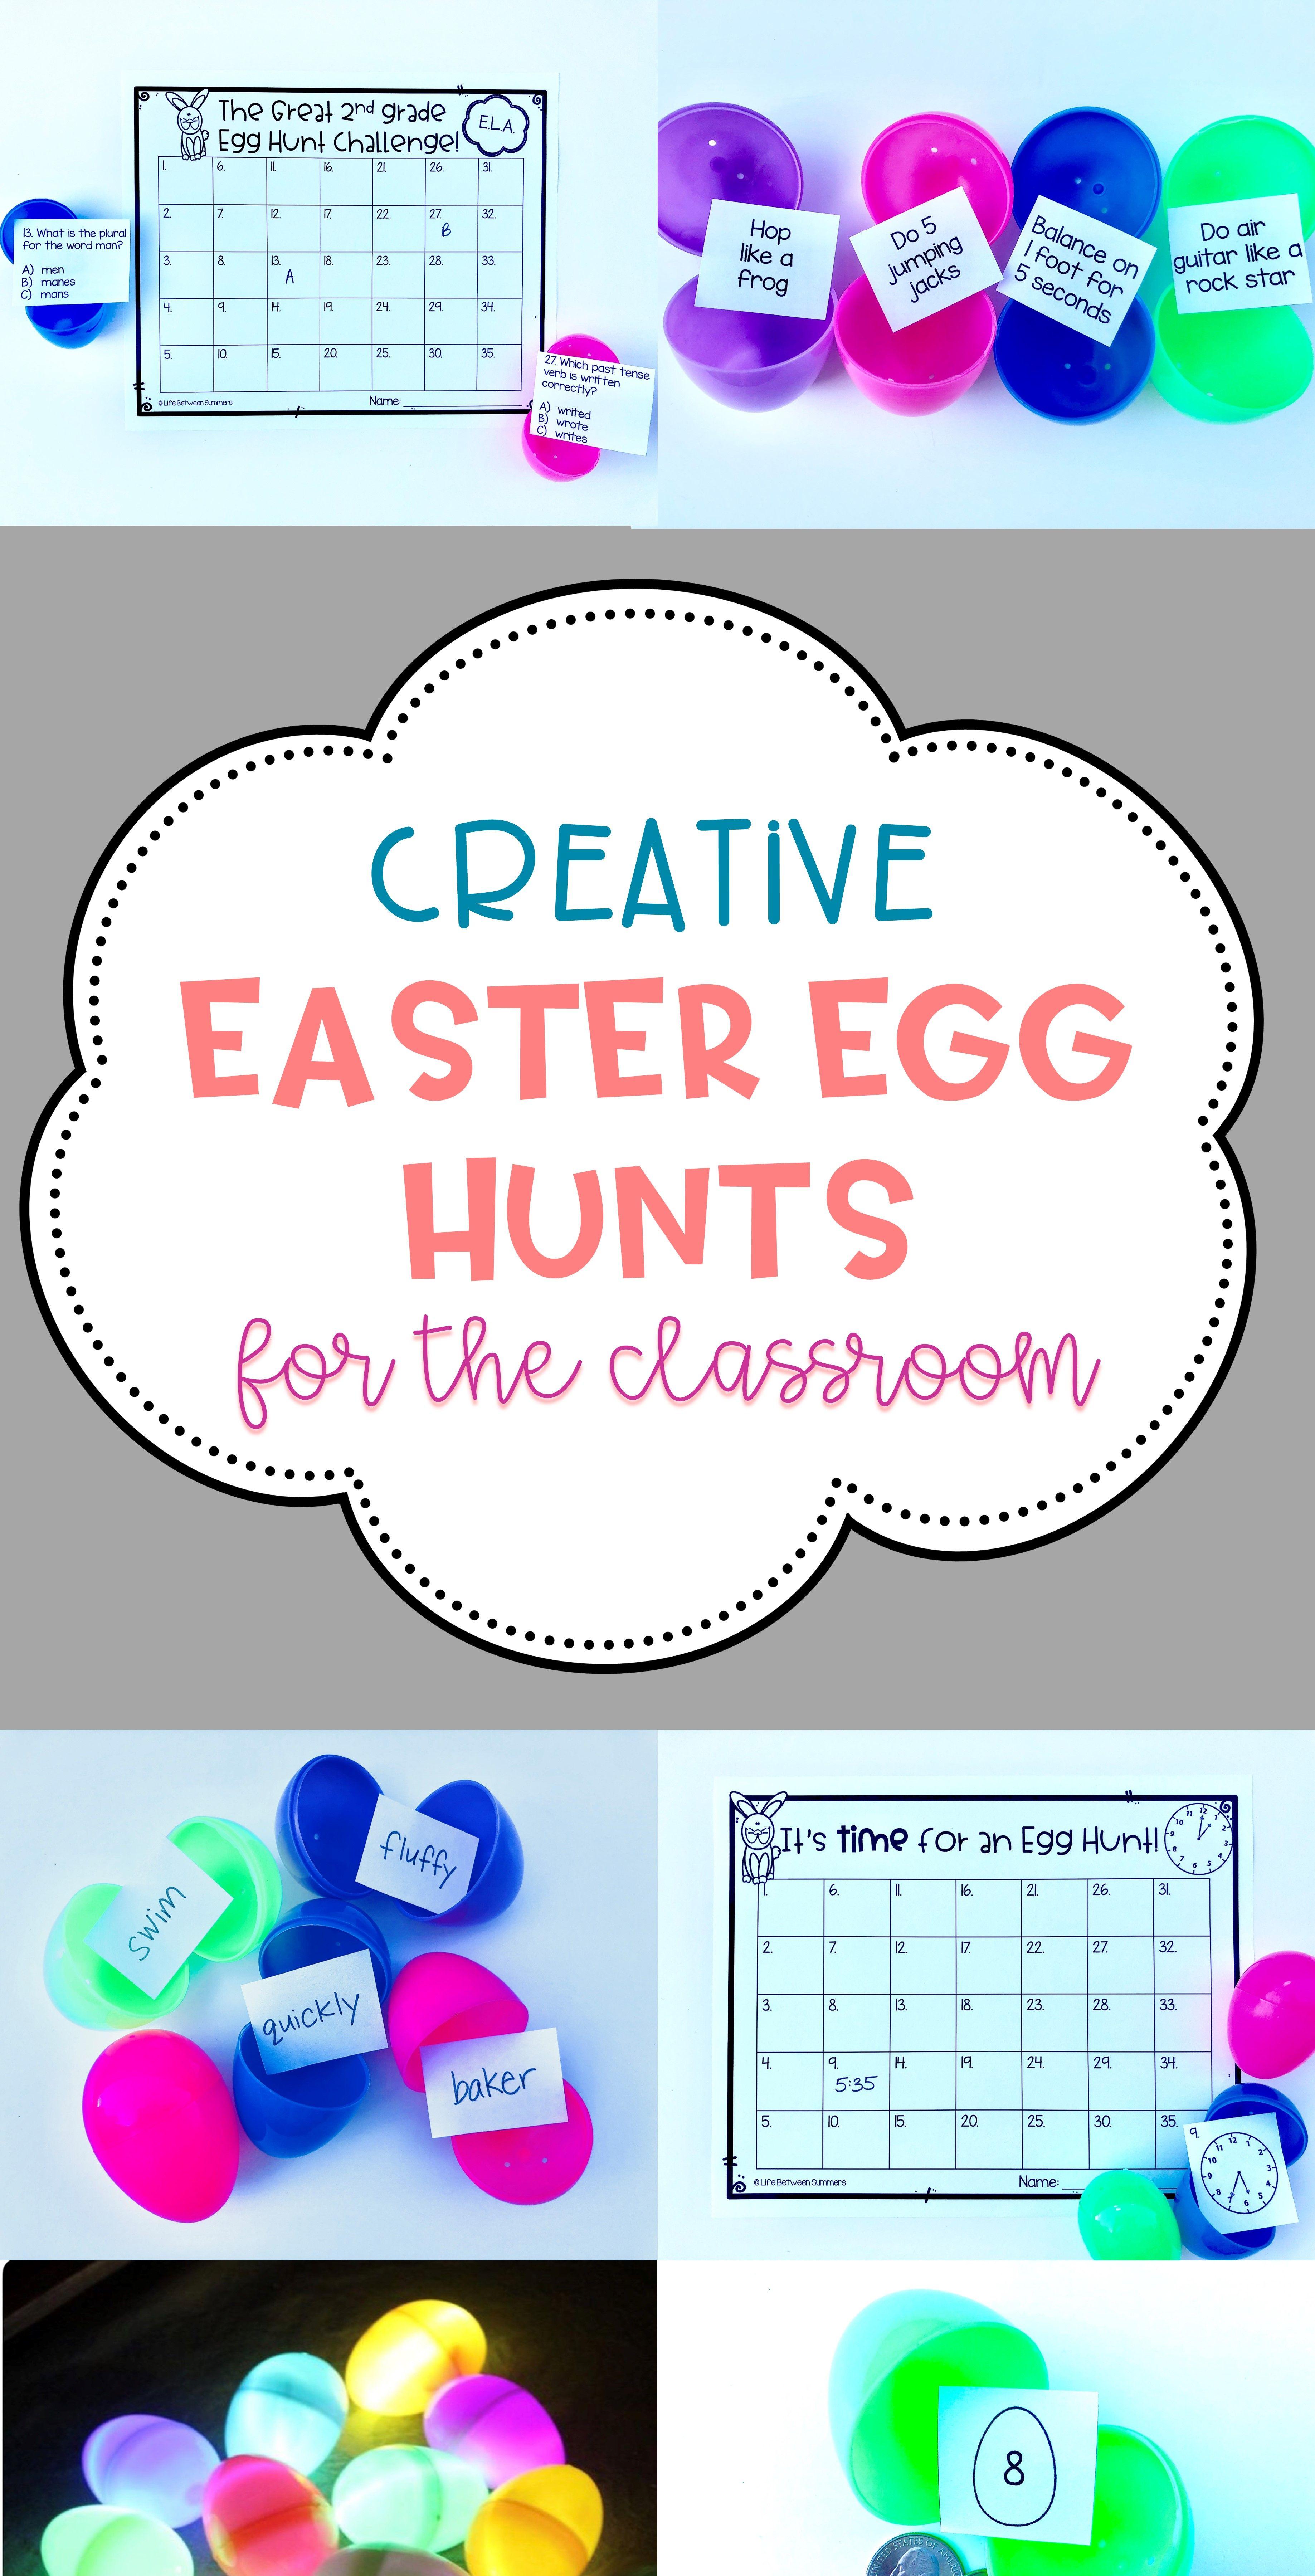 81b56e57ef3fec501a0c2f61fccbe68e - Easter Egg Hunt In Gardena Ca